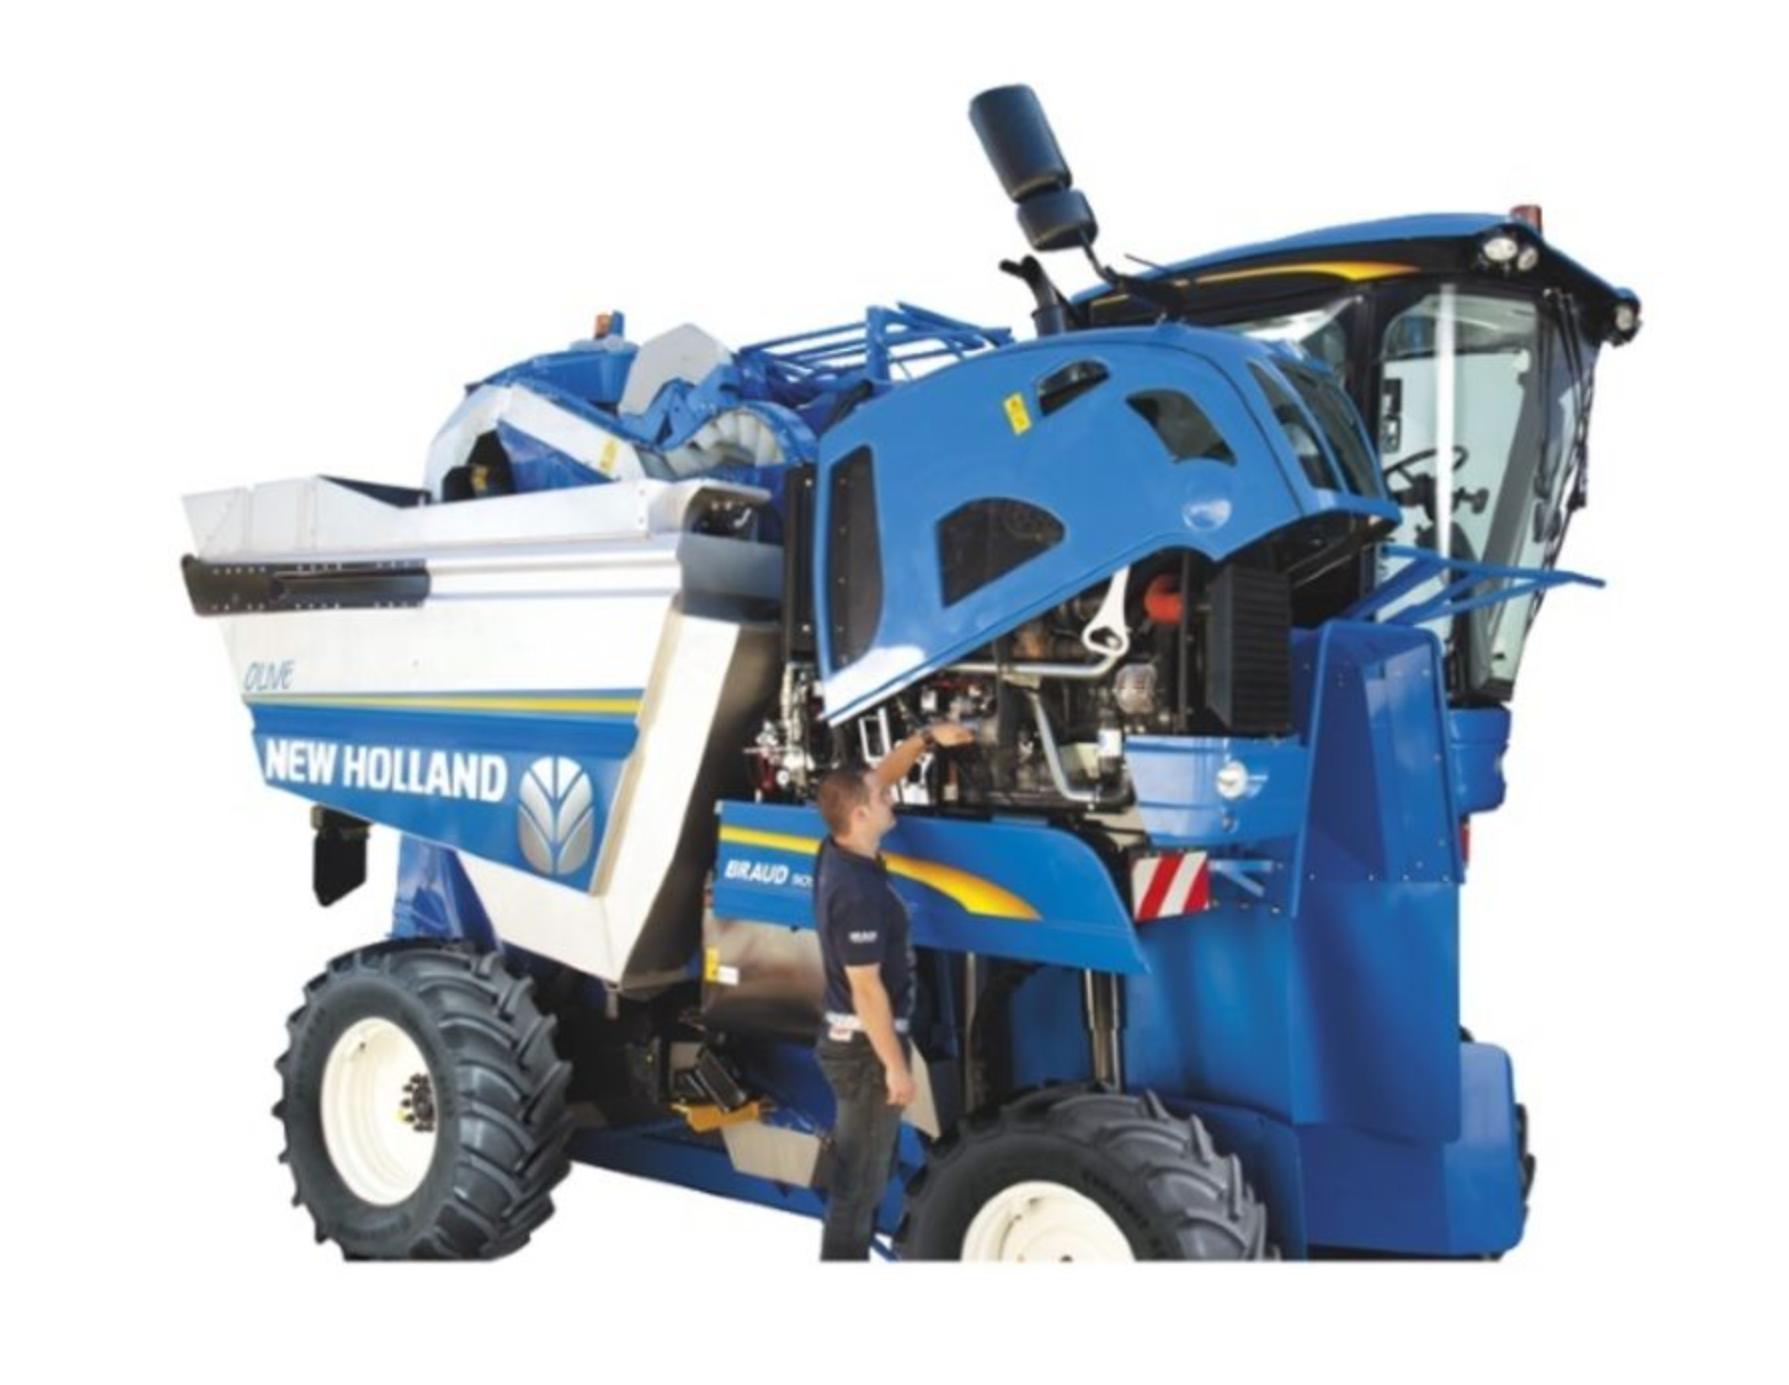 2019-10-01 13_22_25-2019 New Holland Braud 9090X Olive Harvester 2 Hoppers _ Klamath Basin Equipment.png